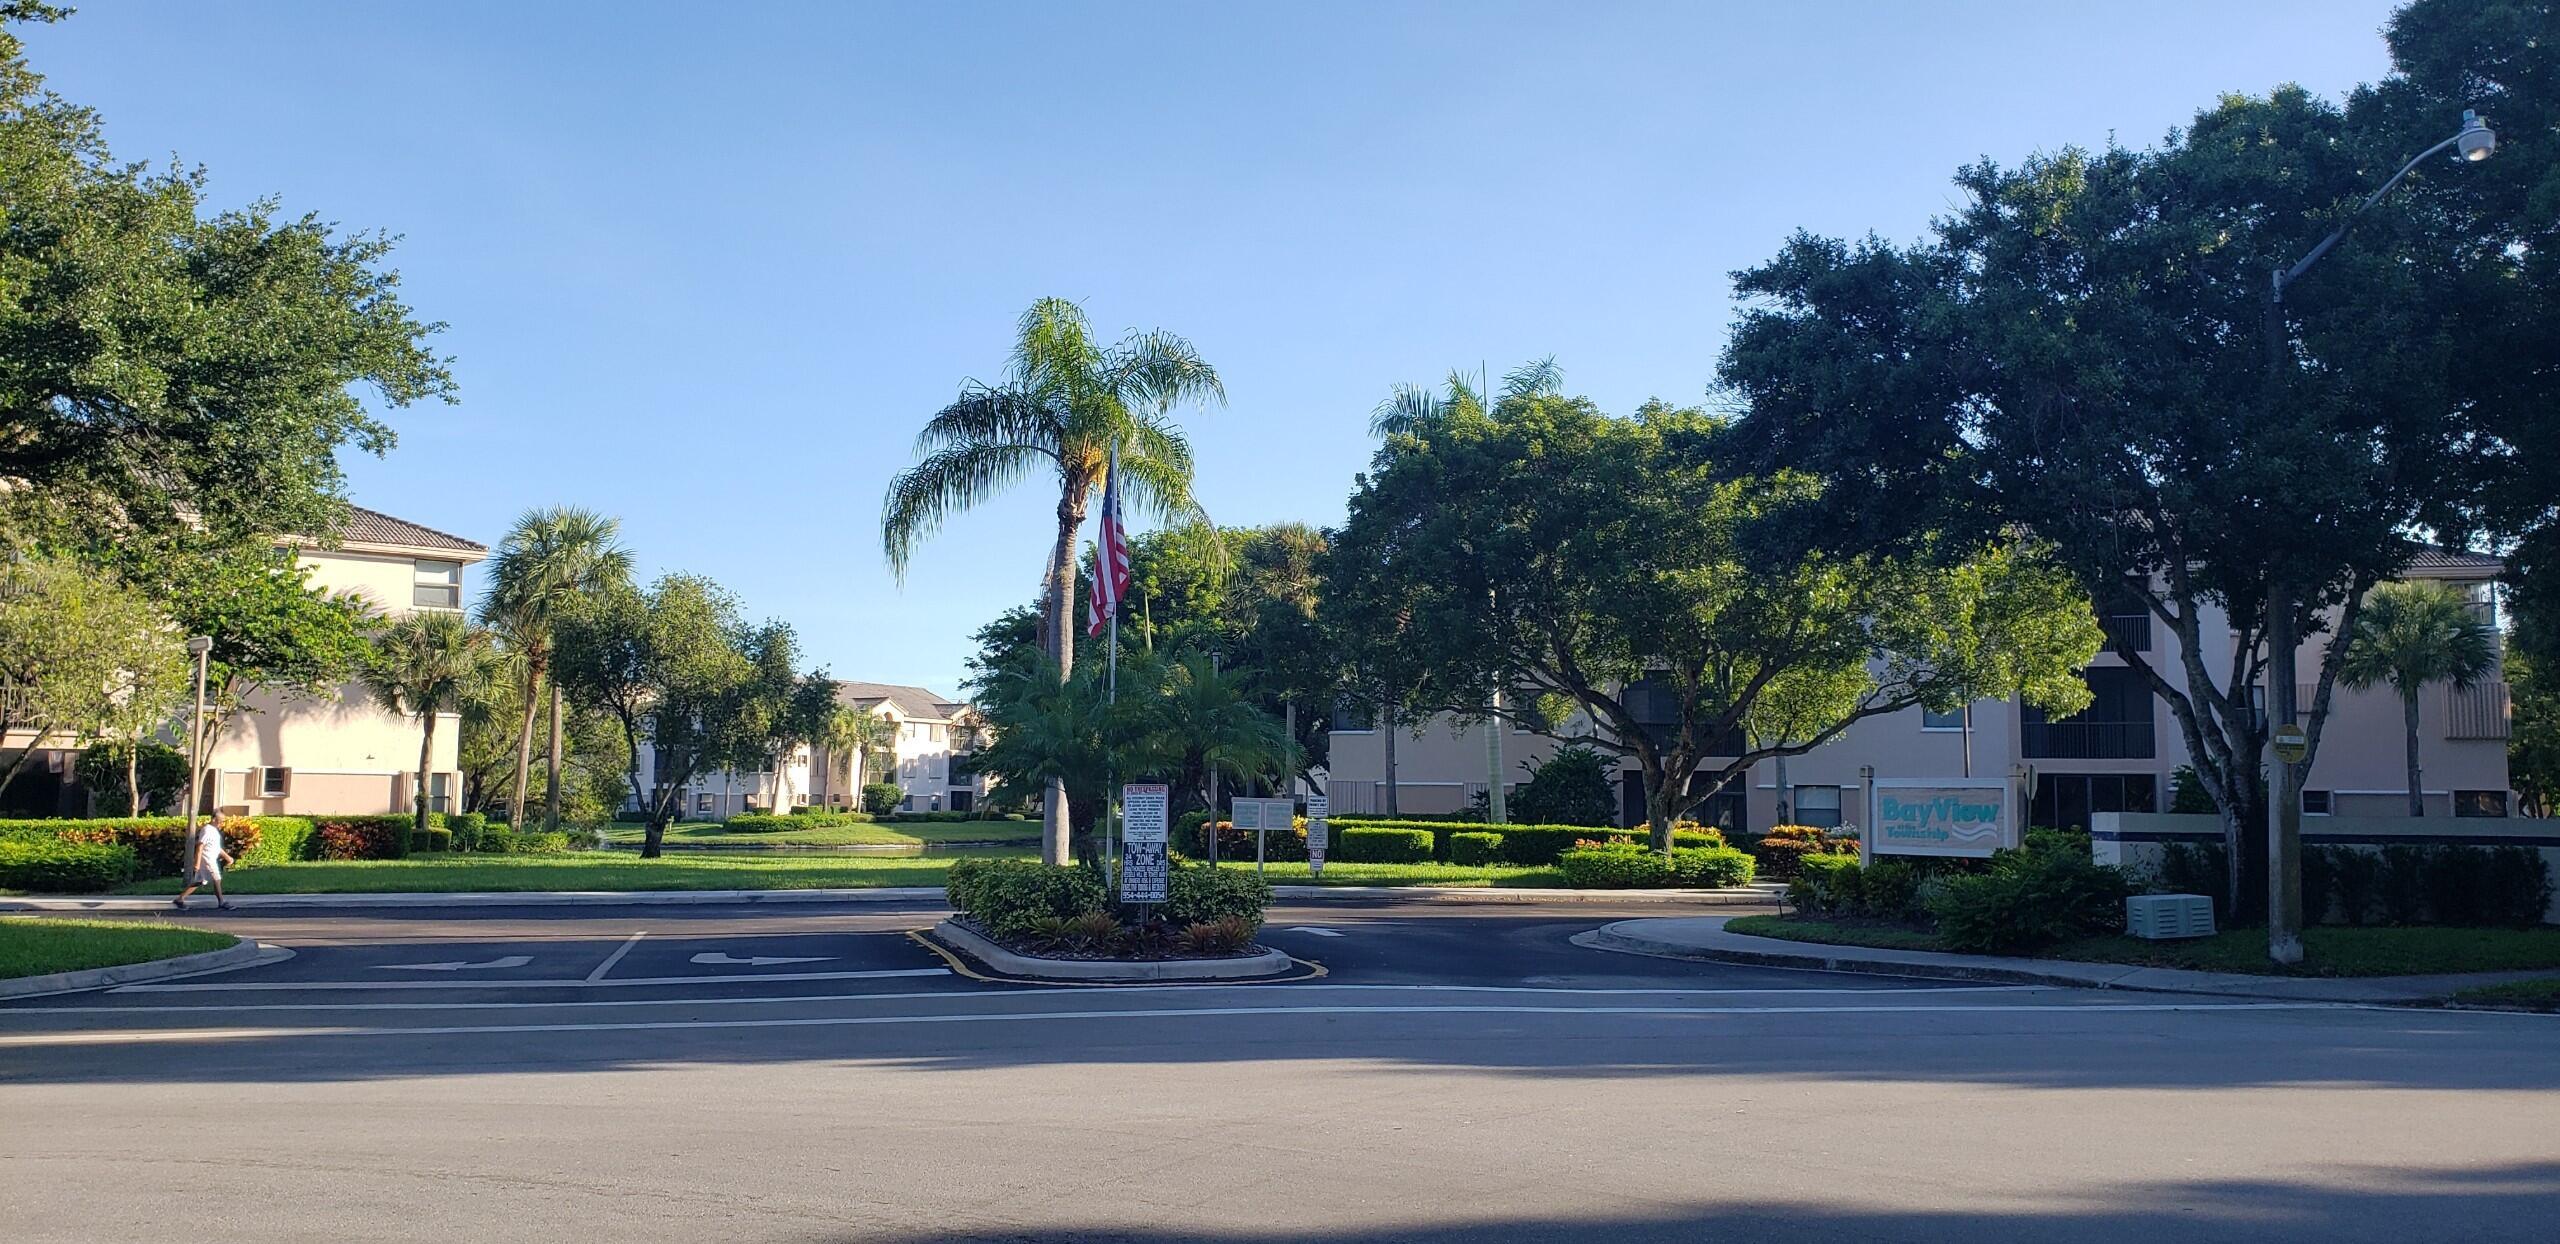 4161 Coral Tree Unit 364, Coconut Creek, Florida 33073